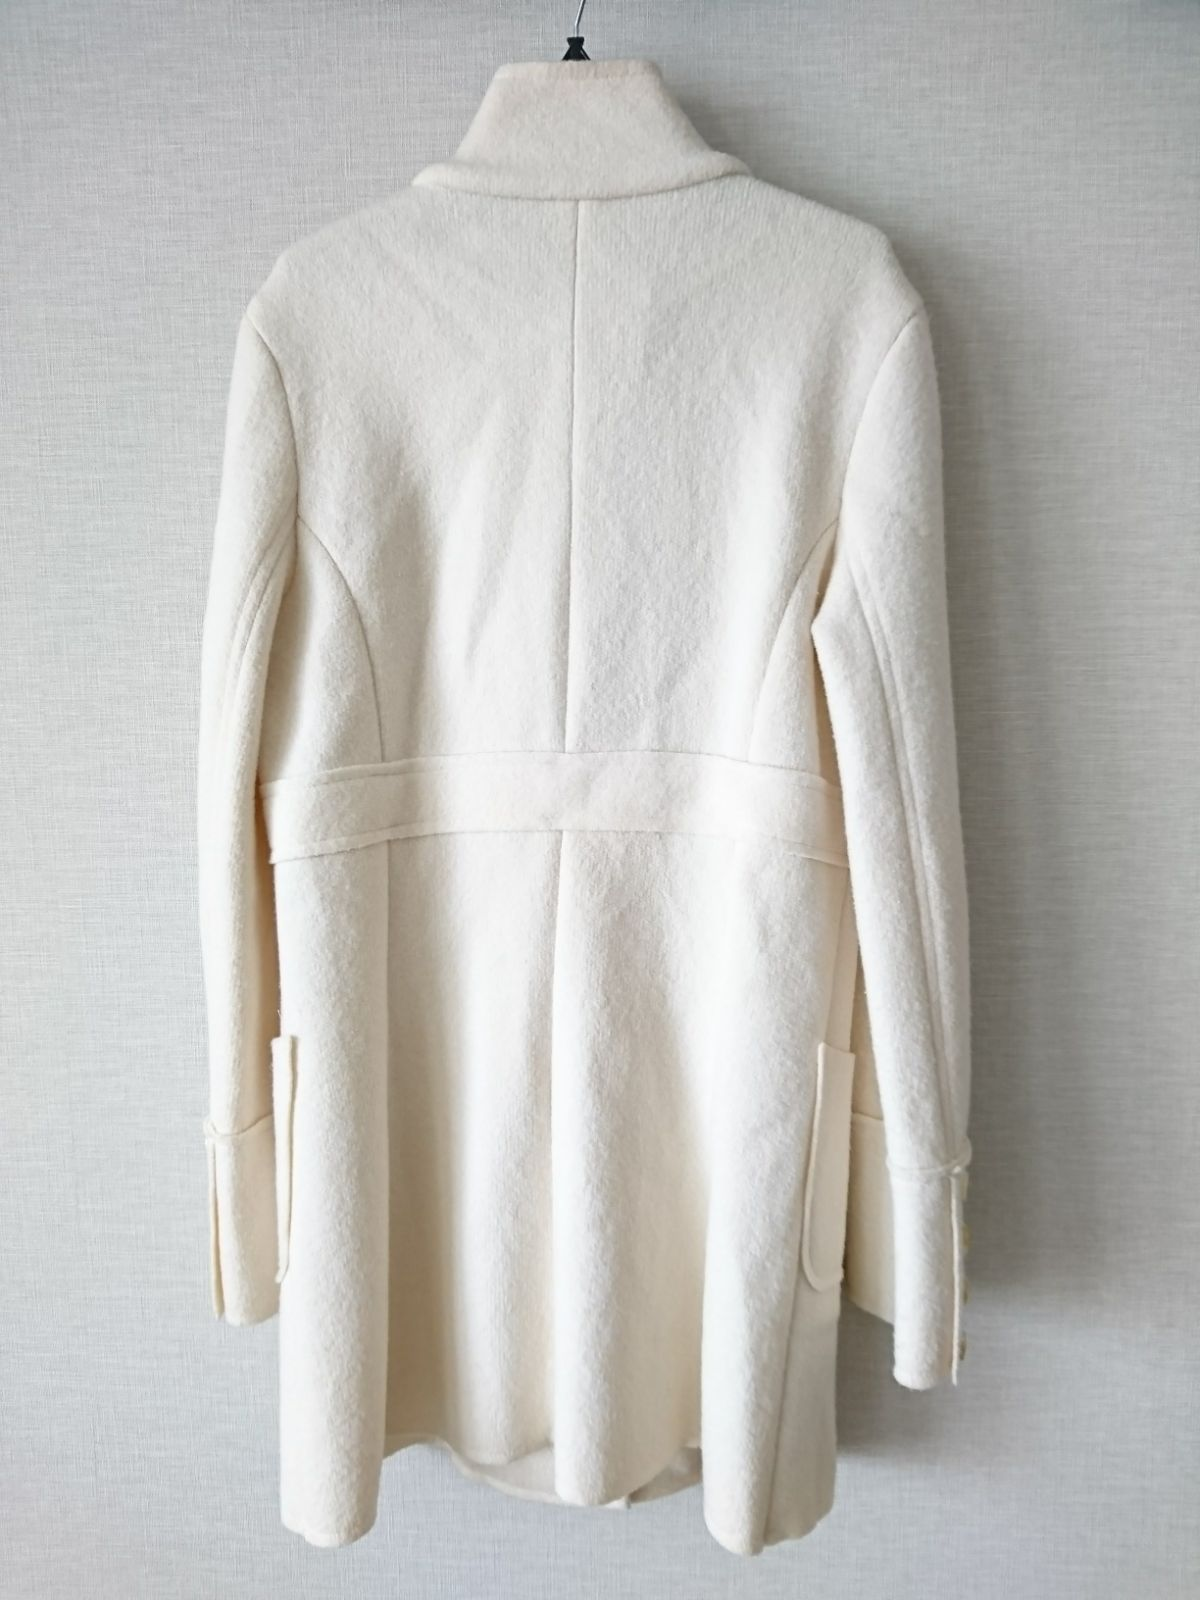 REBONDIR(ルボンディール)のコート